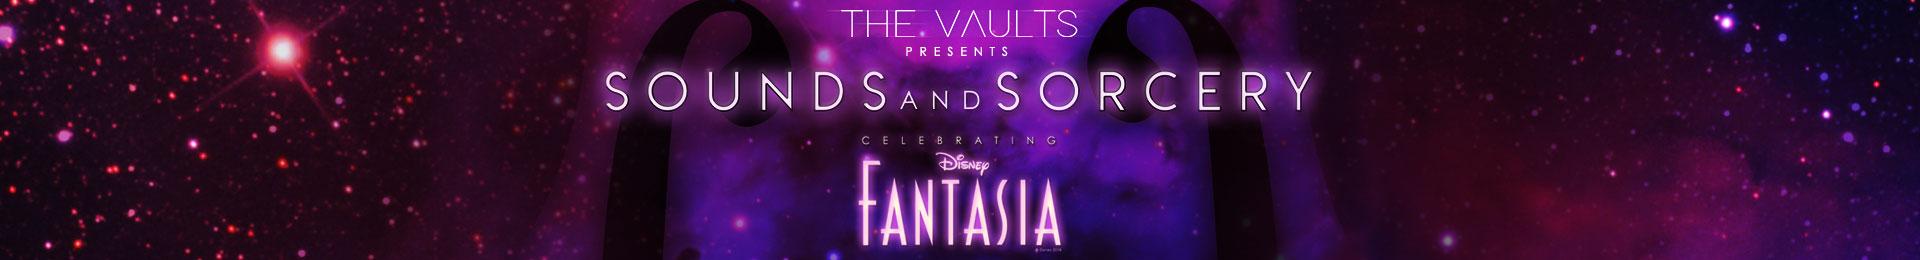 Sounds and Sorcery: Celebrating Disney Fantasia banner image